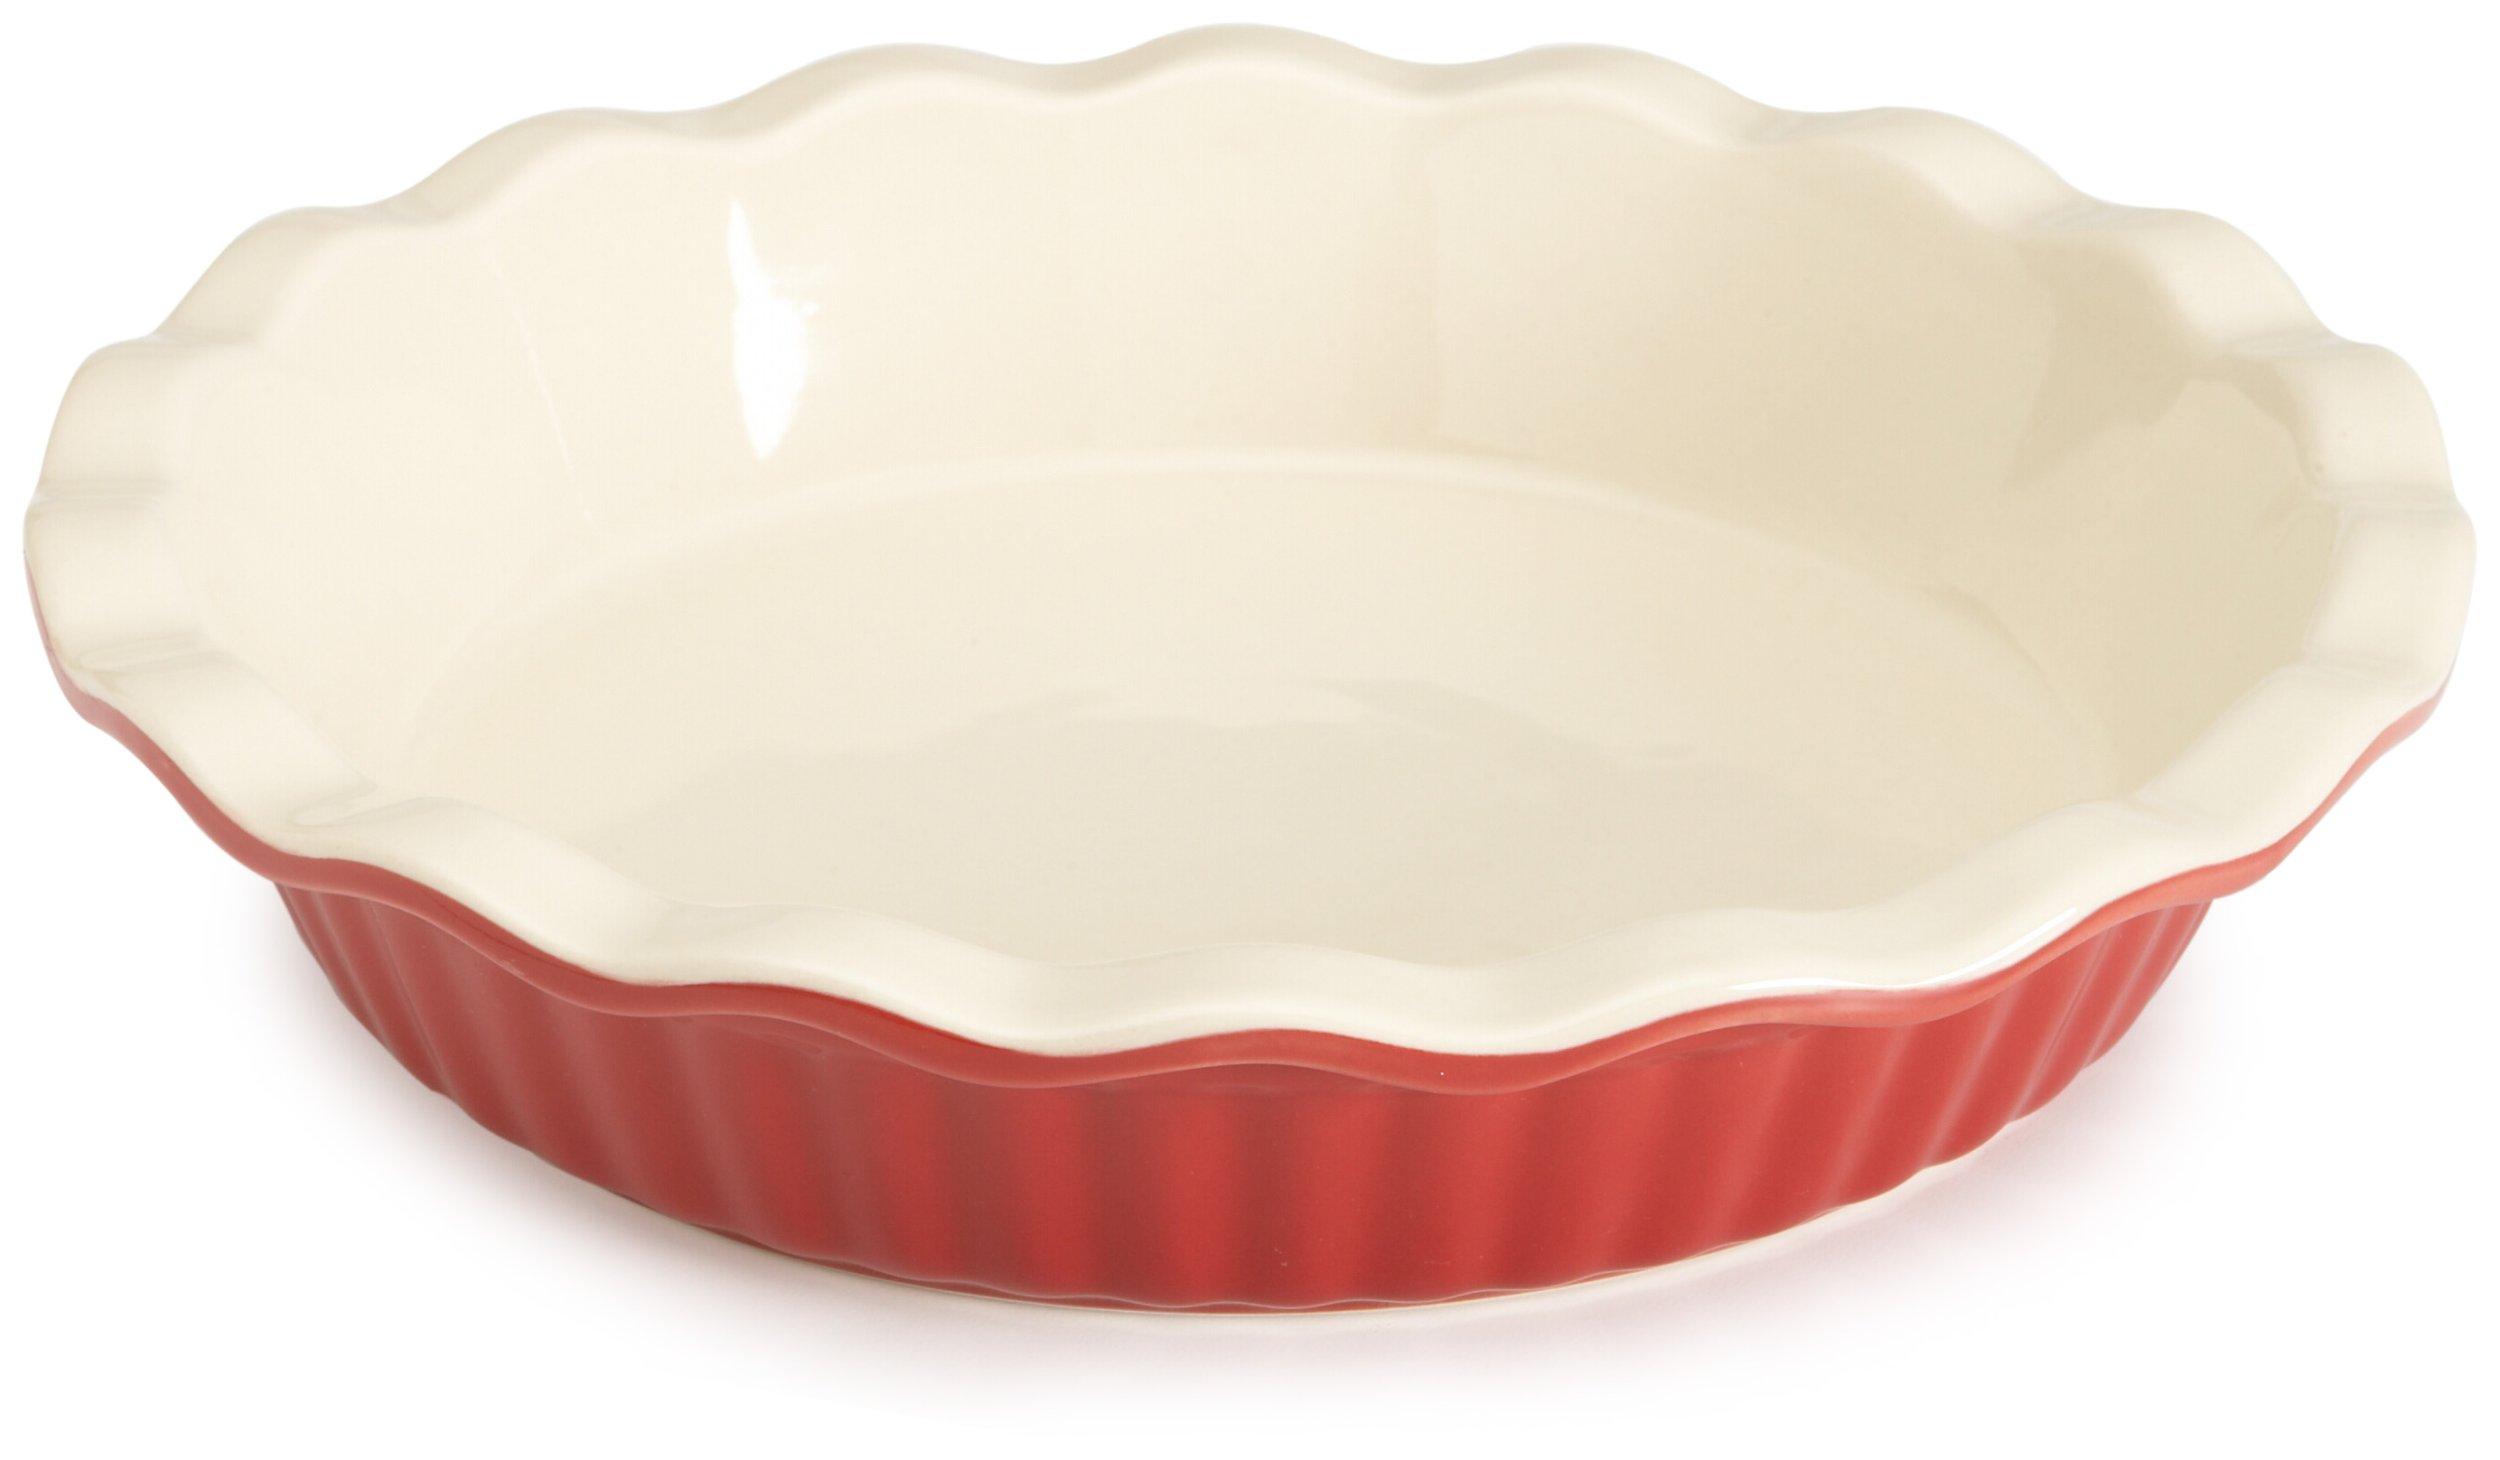 Good Cook Bradshaw International 04412 9′ RED Ceram Pie Plate by Good Cook